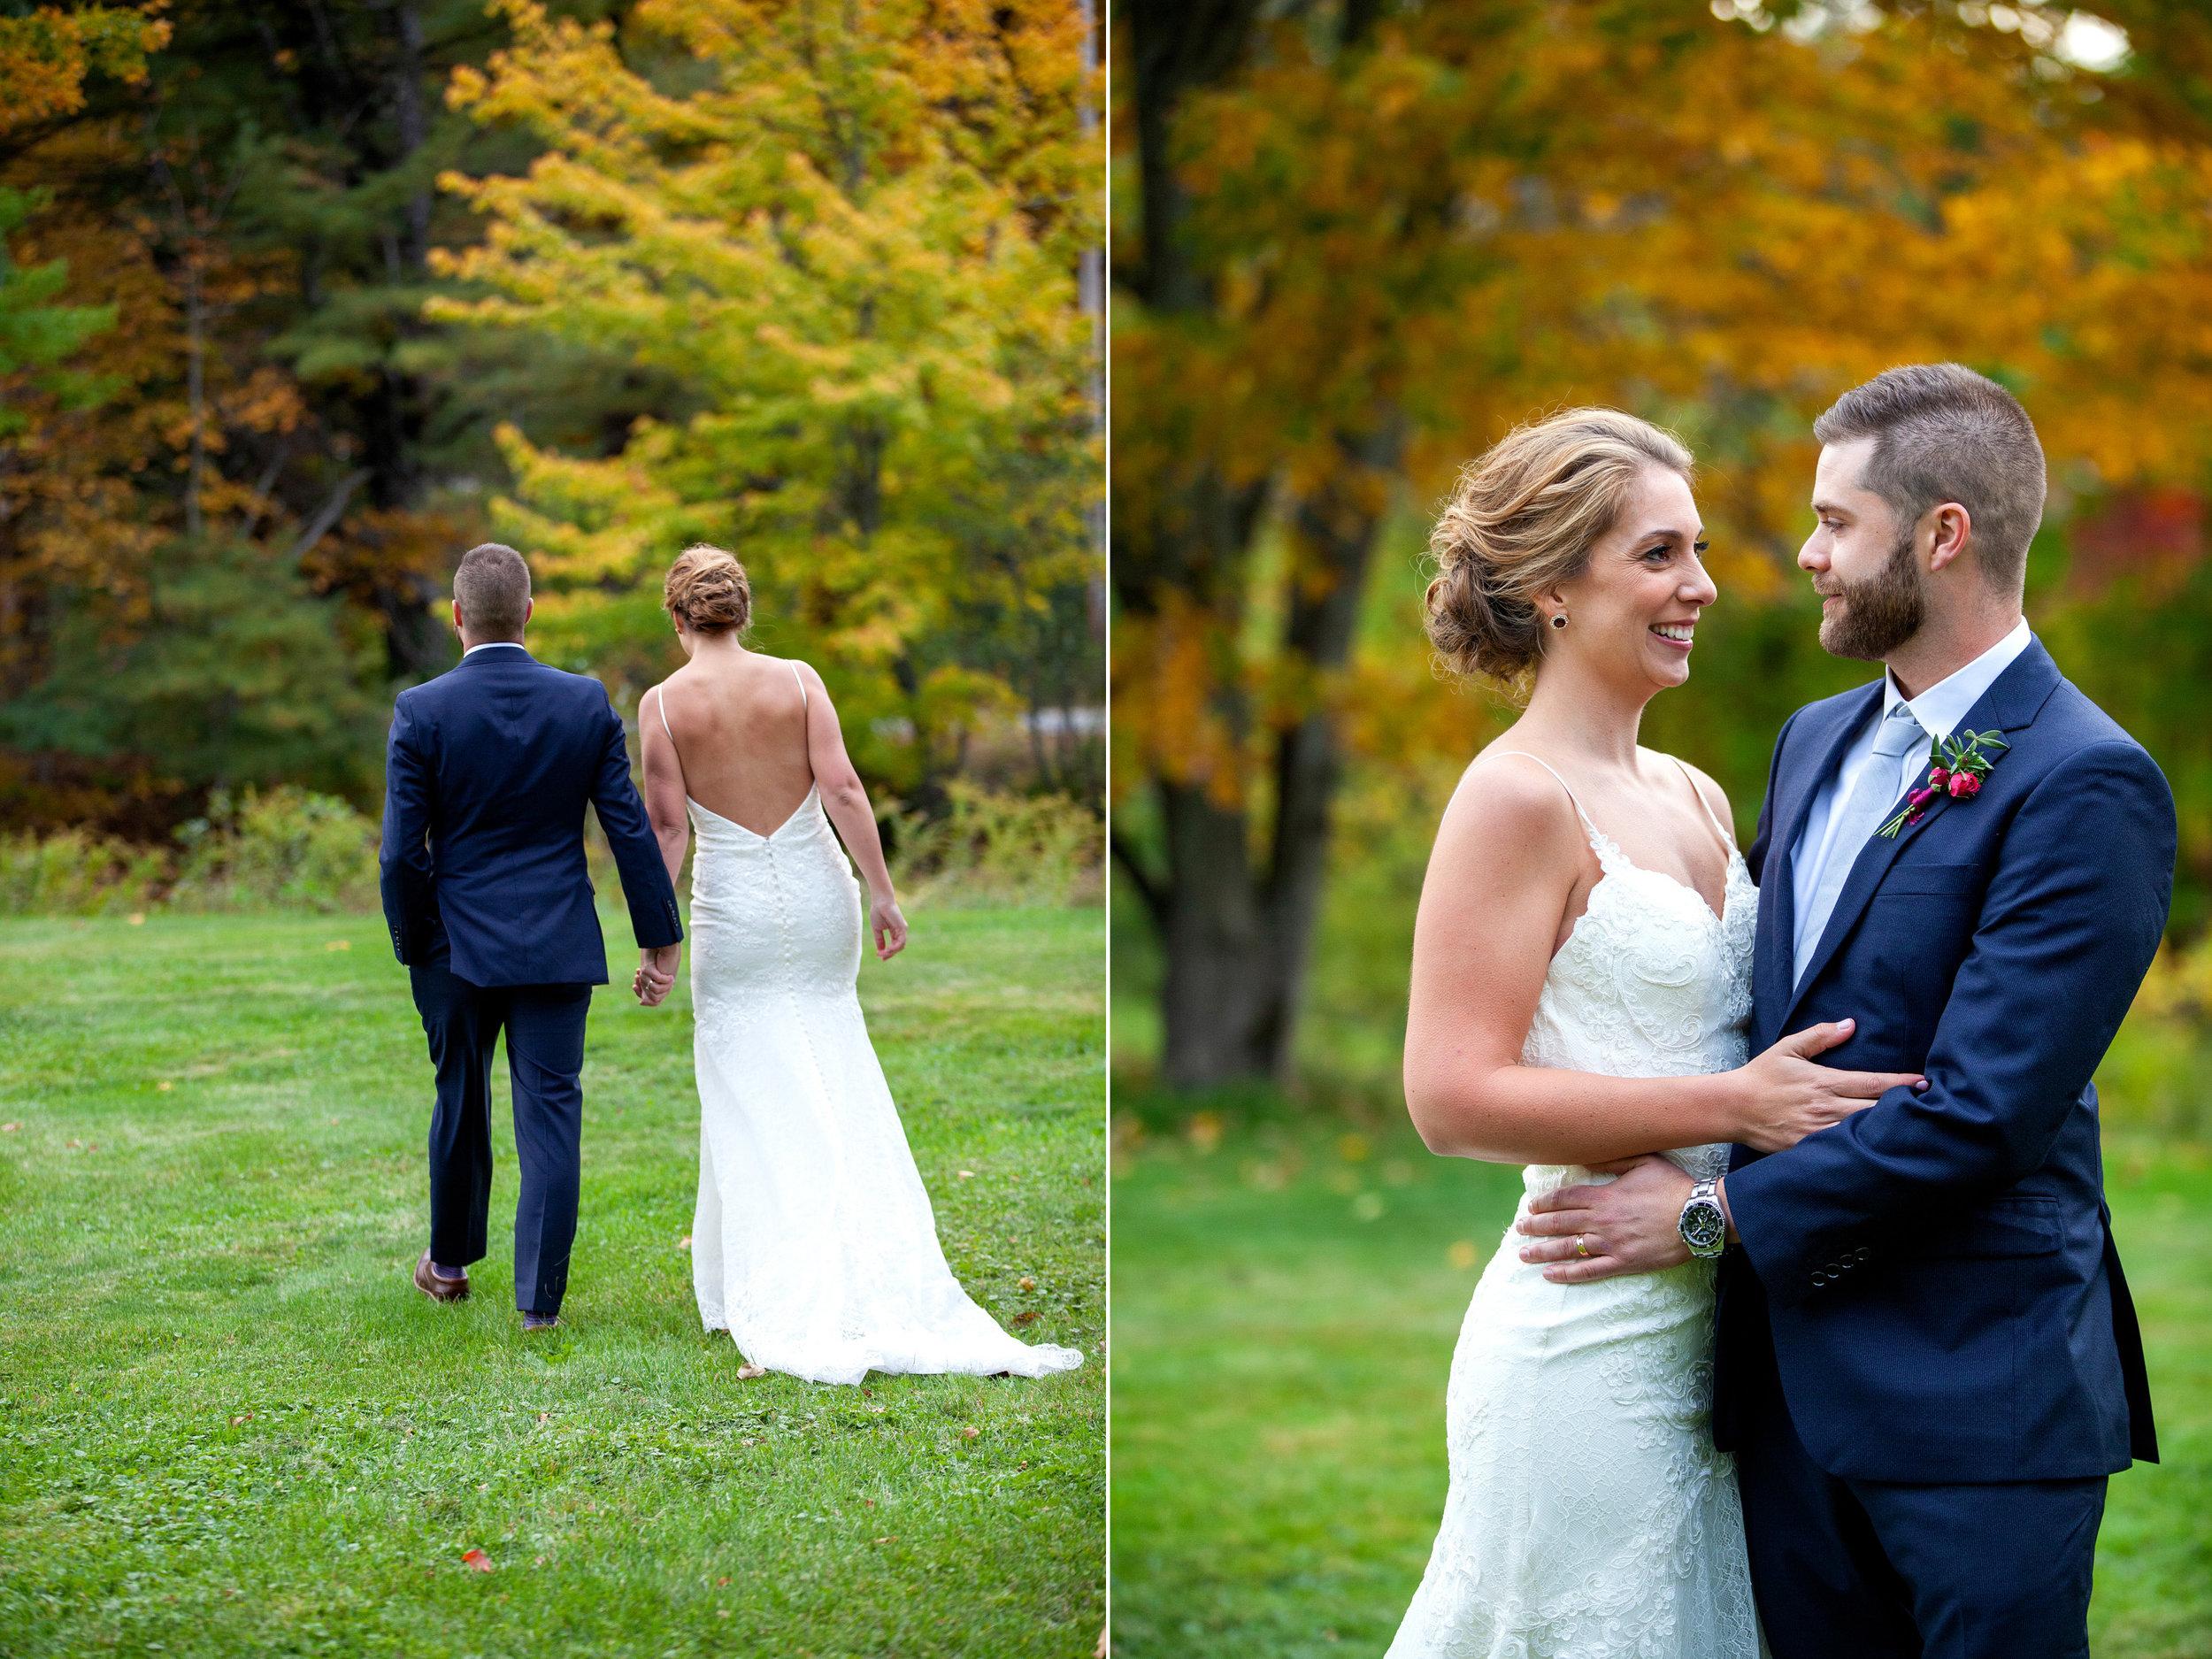 maine-farm-wedding-photographer-stepheneycollins-258b.jpg